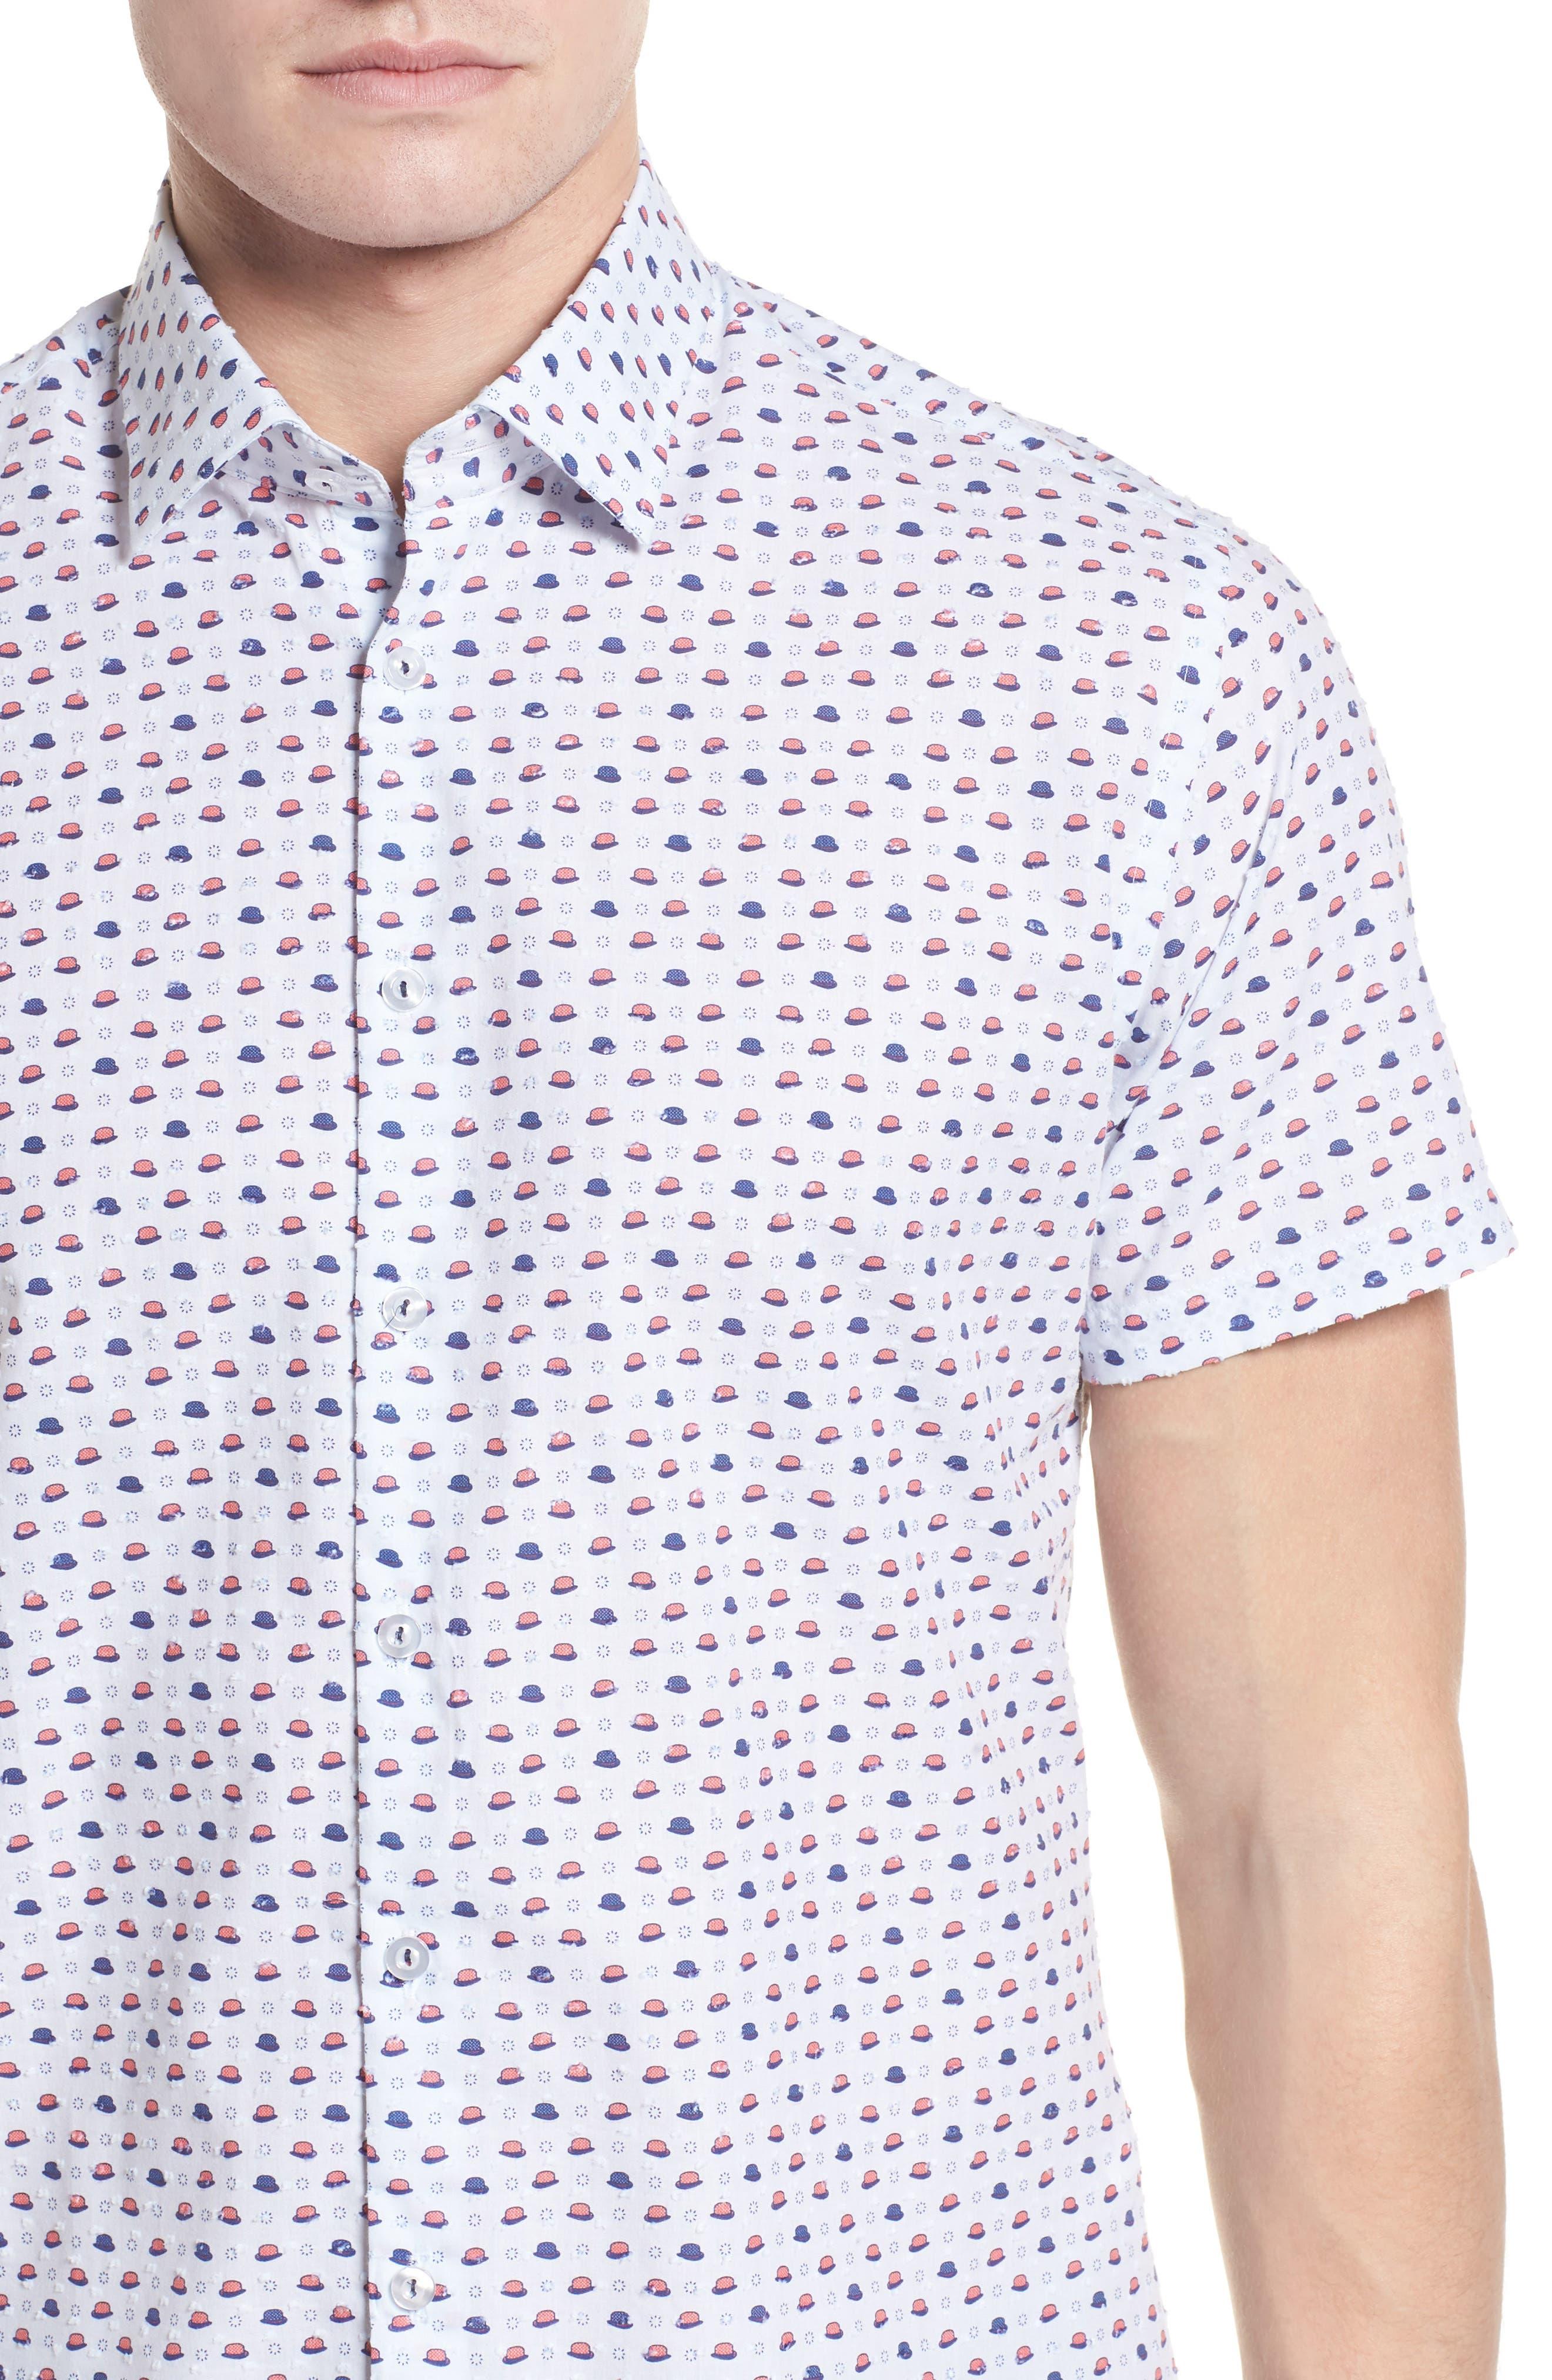 Contemporary Fit Bowler Hat Print Sport Shirt,                             Alternate thumbnail 4, color,                             White